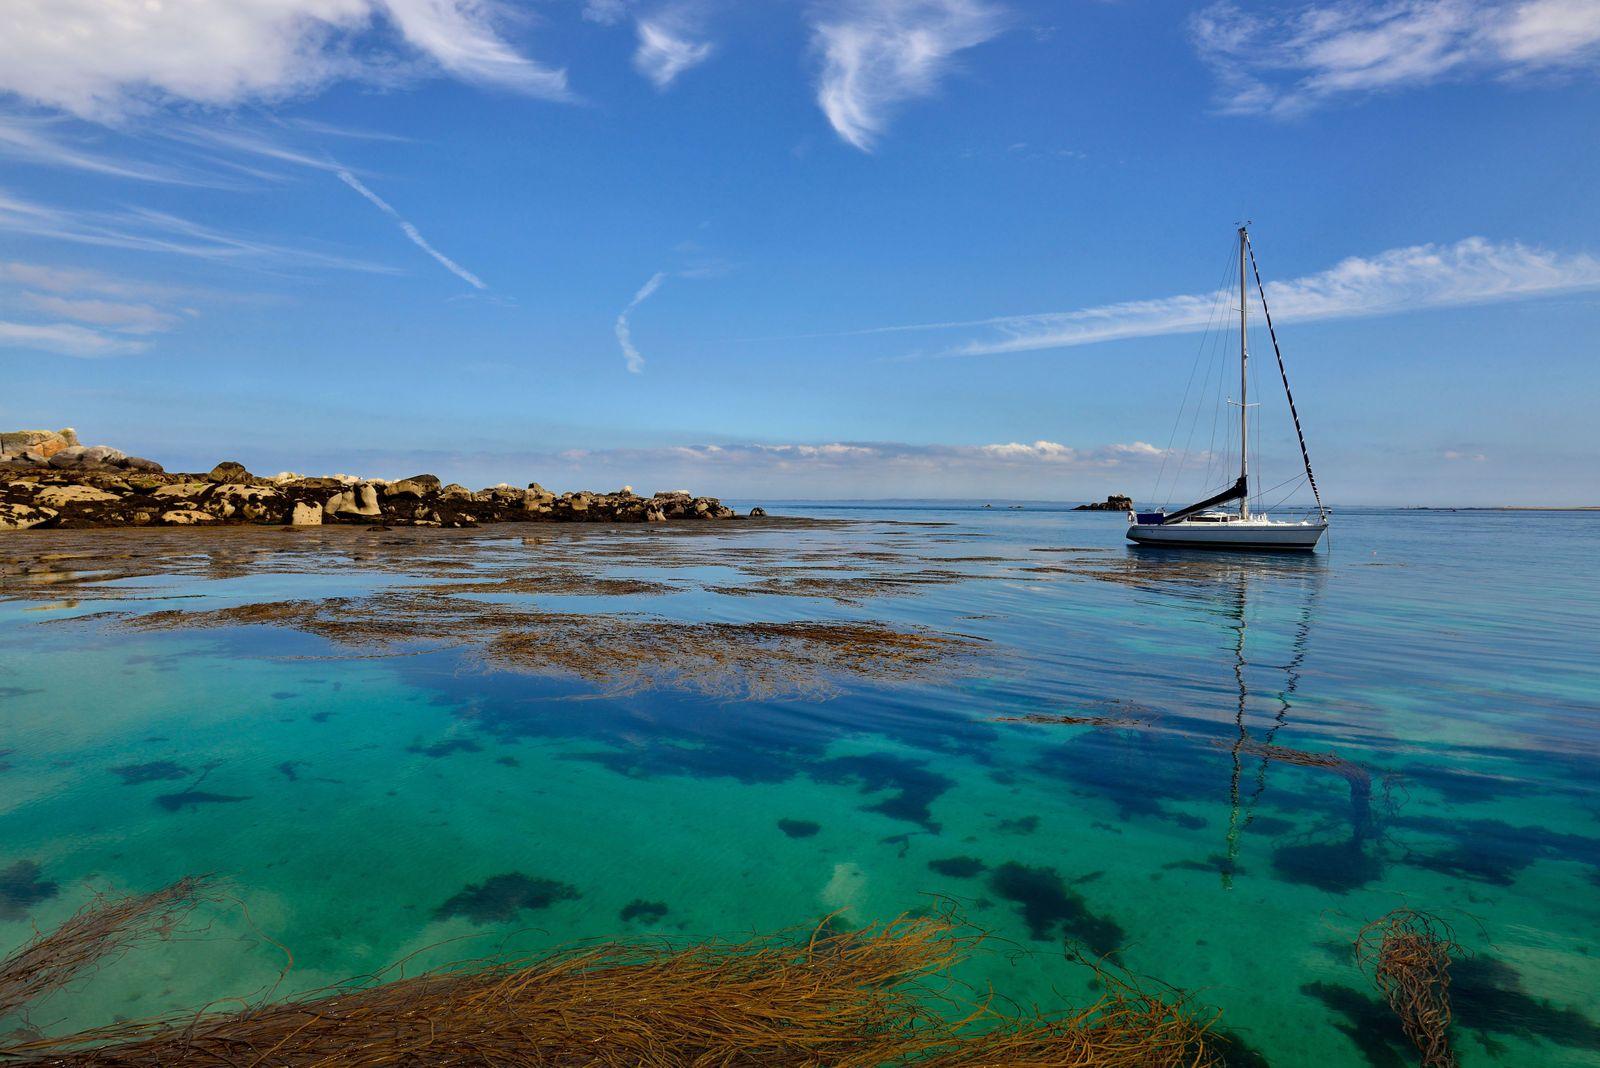 Archipelago of Molene in the Iroise sea